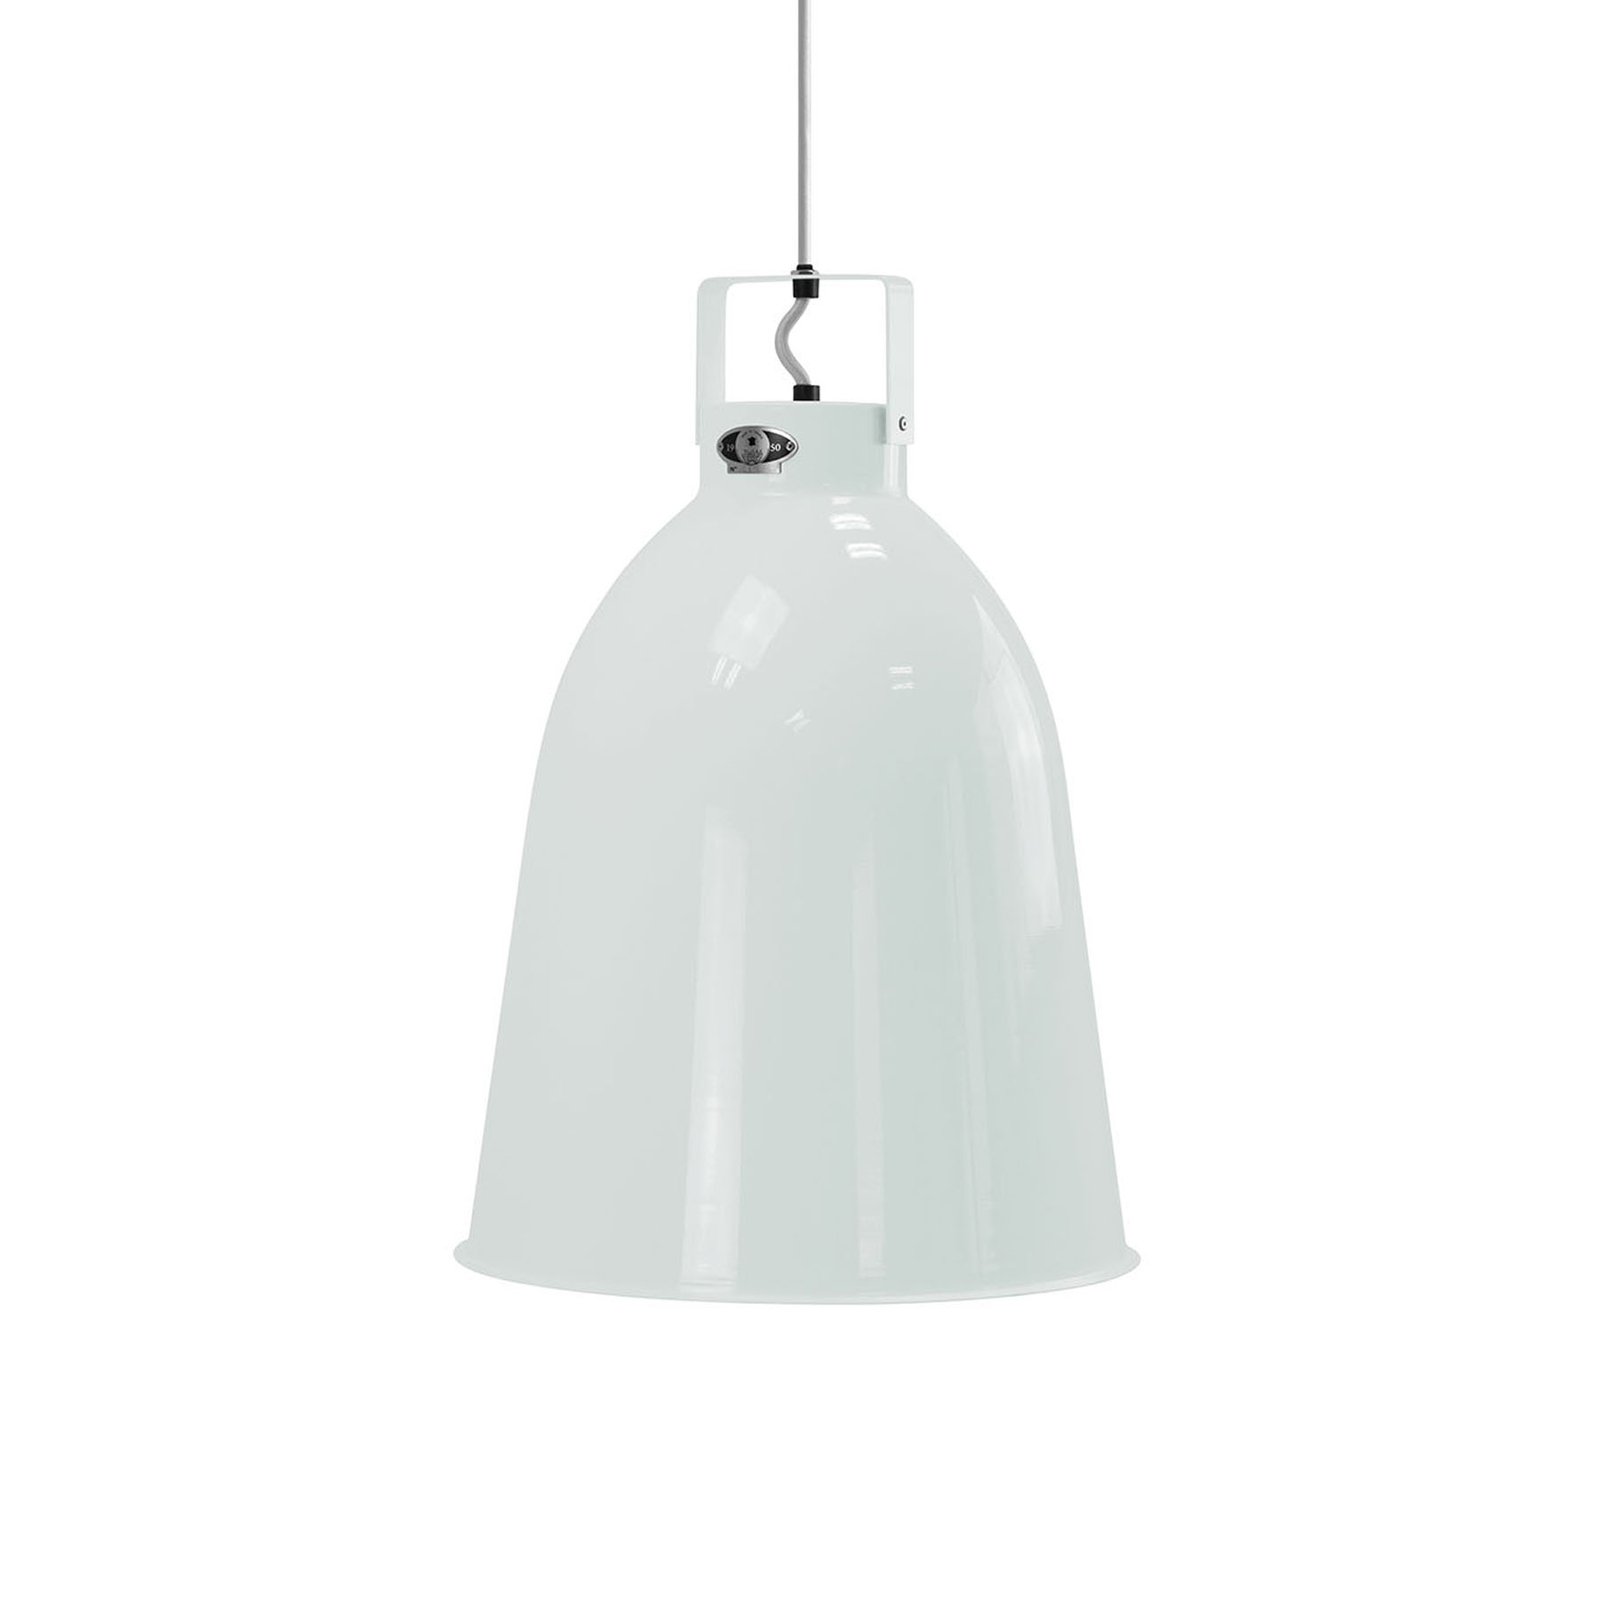 Jieldé Clément C360 lampa wisząca biała Ø 36cm